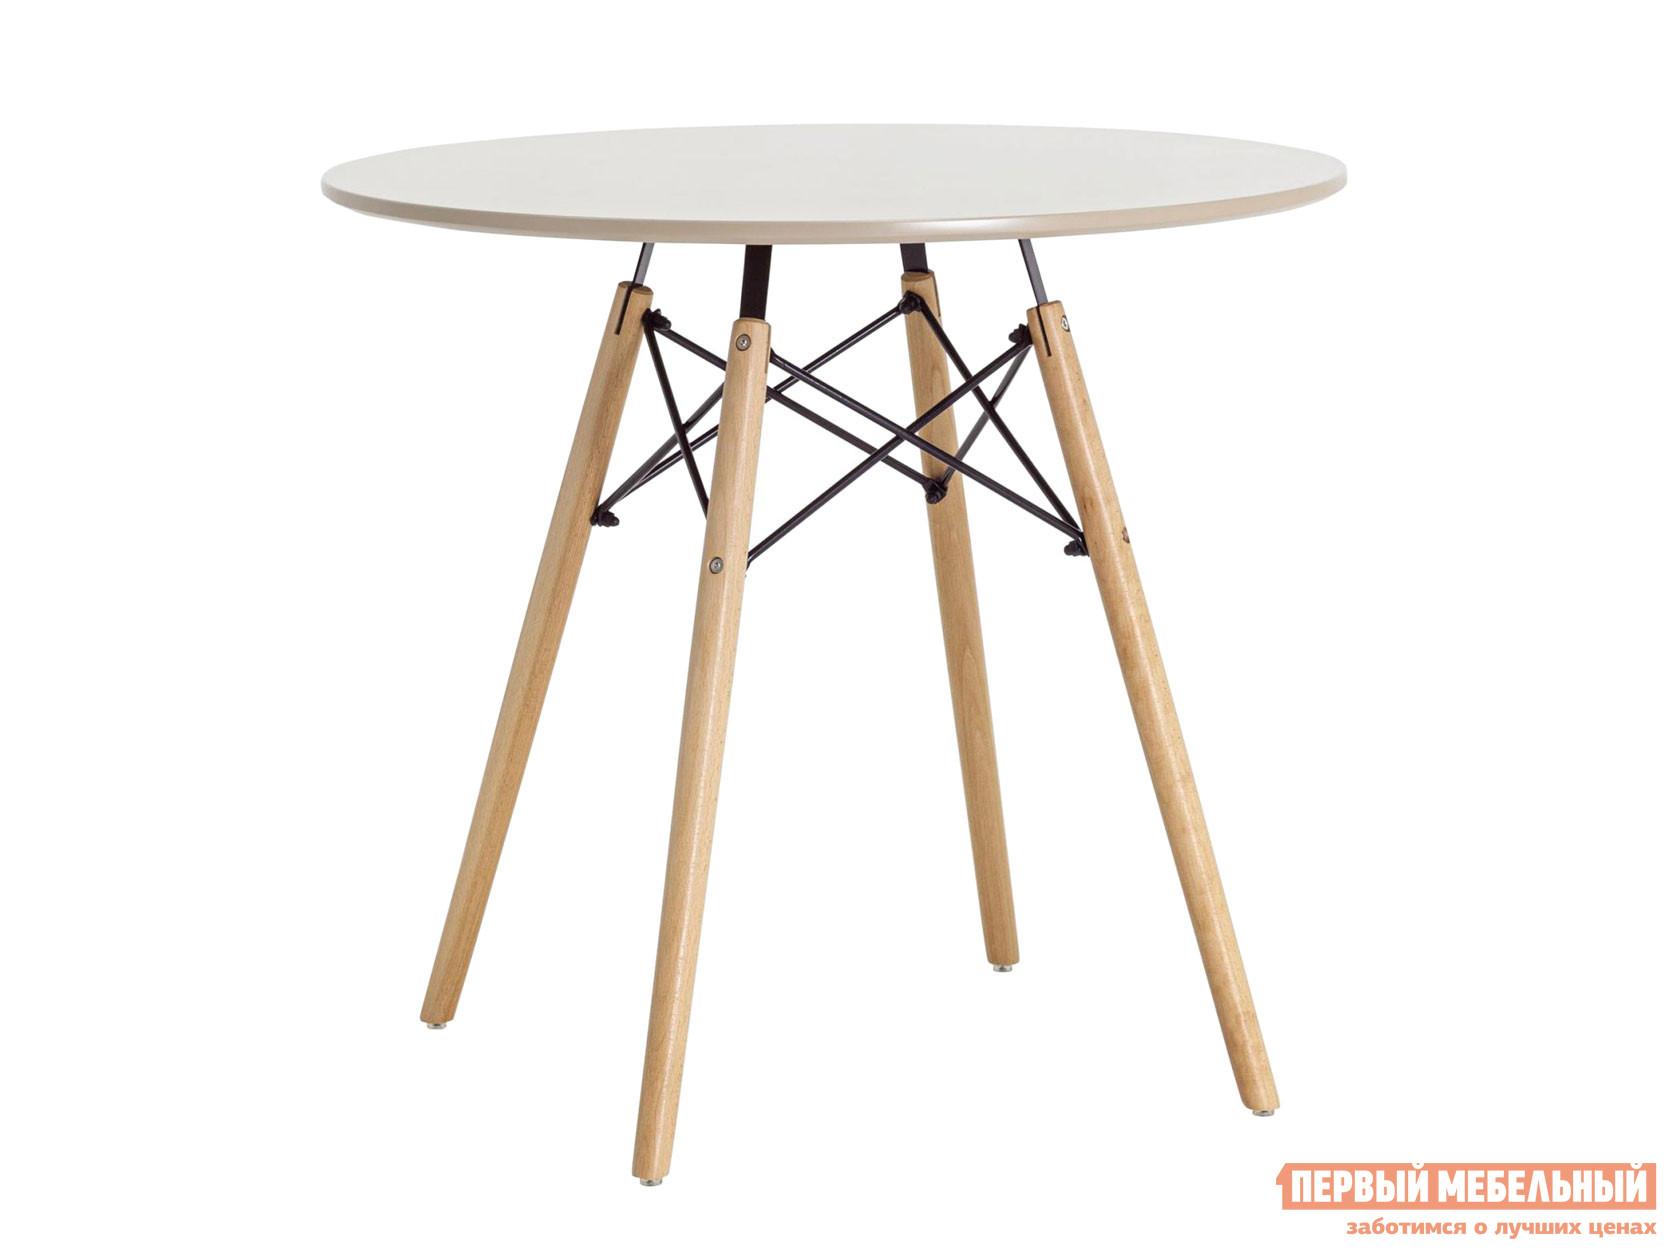 Кухонный стол  EAMES DSW CHAD Бежевый Stool Group 120318